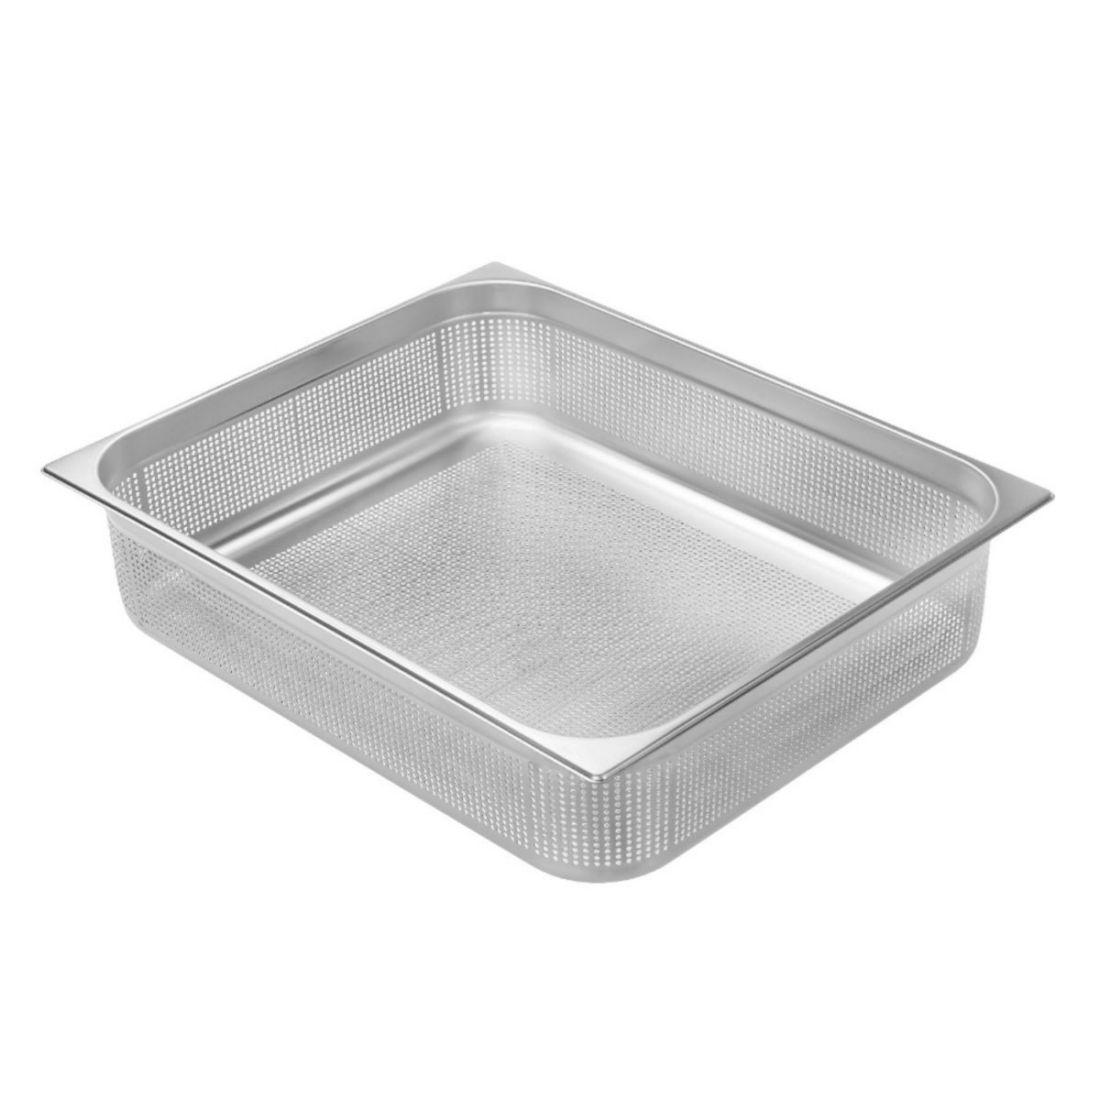 Gastronádoba Profi děrovaná GN 2/1 200 mm